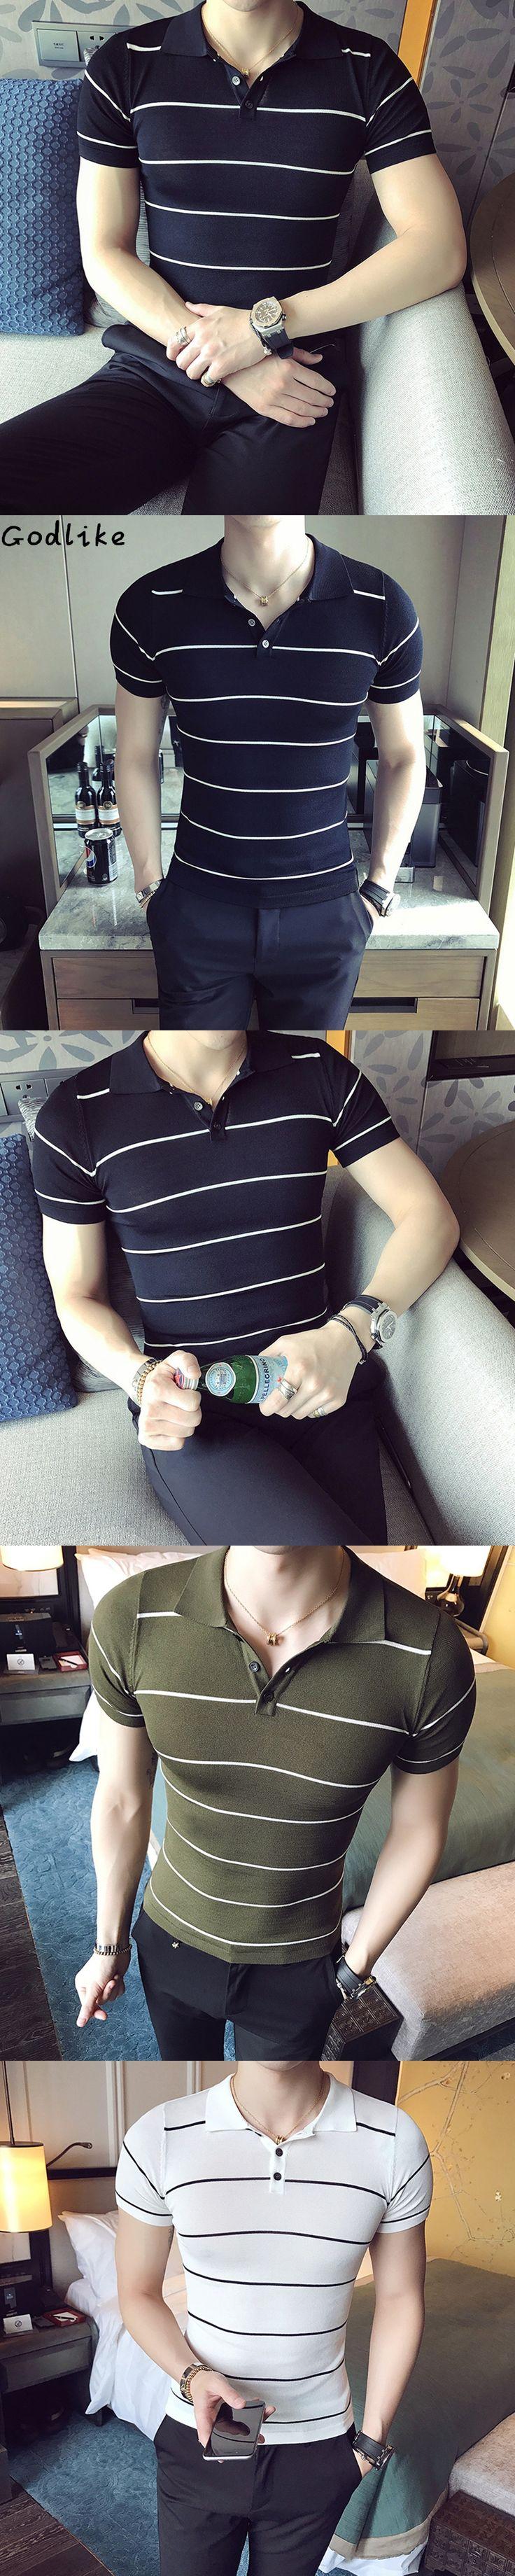 GODLIKE Polo Shirt Men Camisa Masculina Business & Casual Men's Striped Fashion 2017 Summer stripe Polo Shirts Short Sleeve